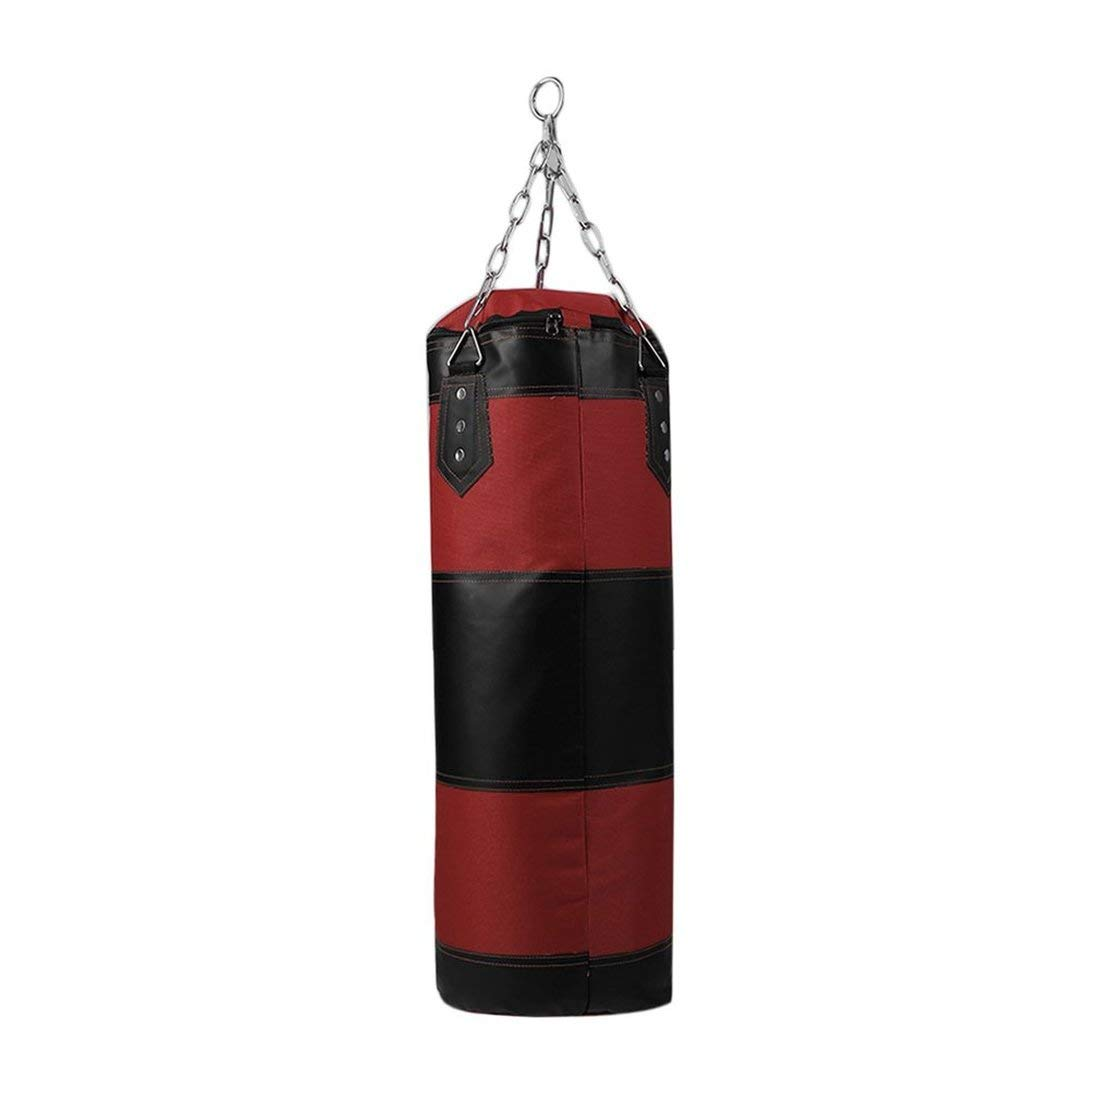 Formulaone 70 cm Saco de Arena Empty Entrenamiento Fitness MMA Boxeo Gancho Bolso Colgante Kick Fight Bag Sand Punch Saco de Arena Saco de Dormir